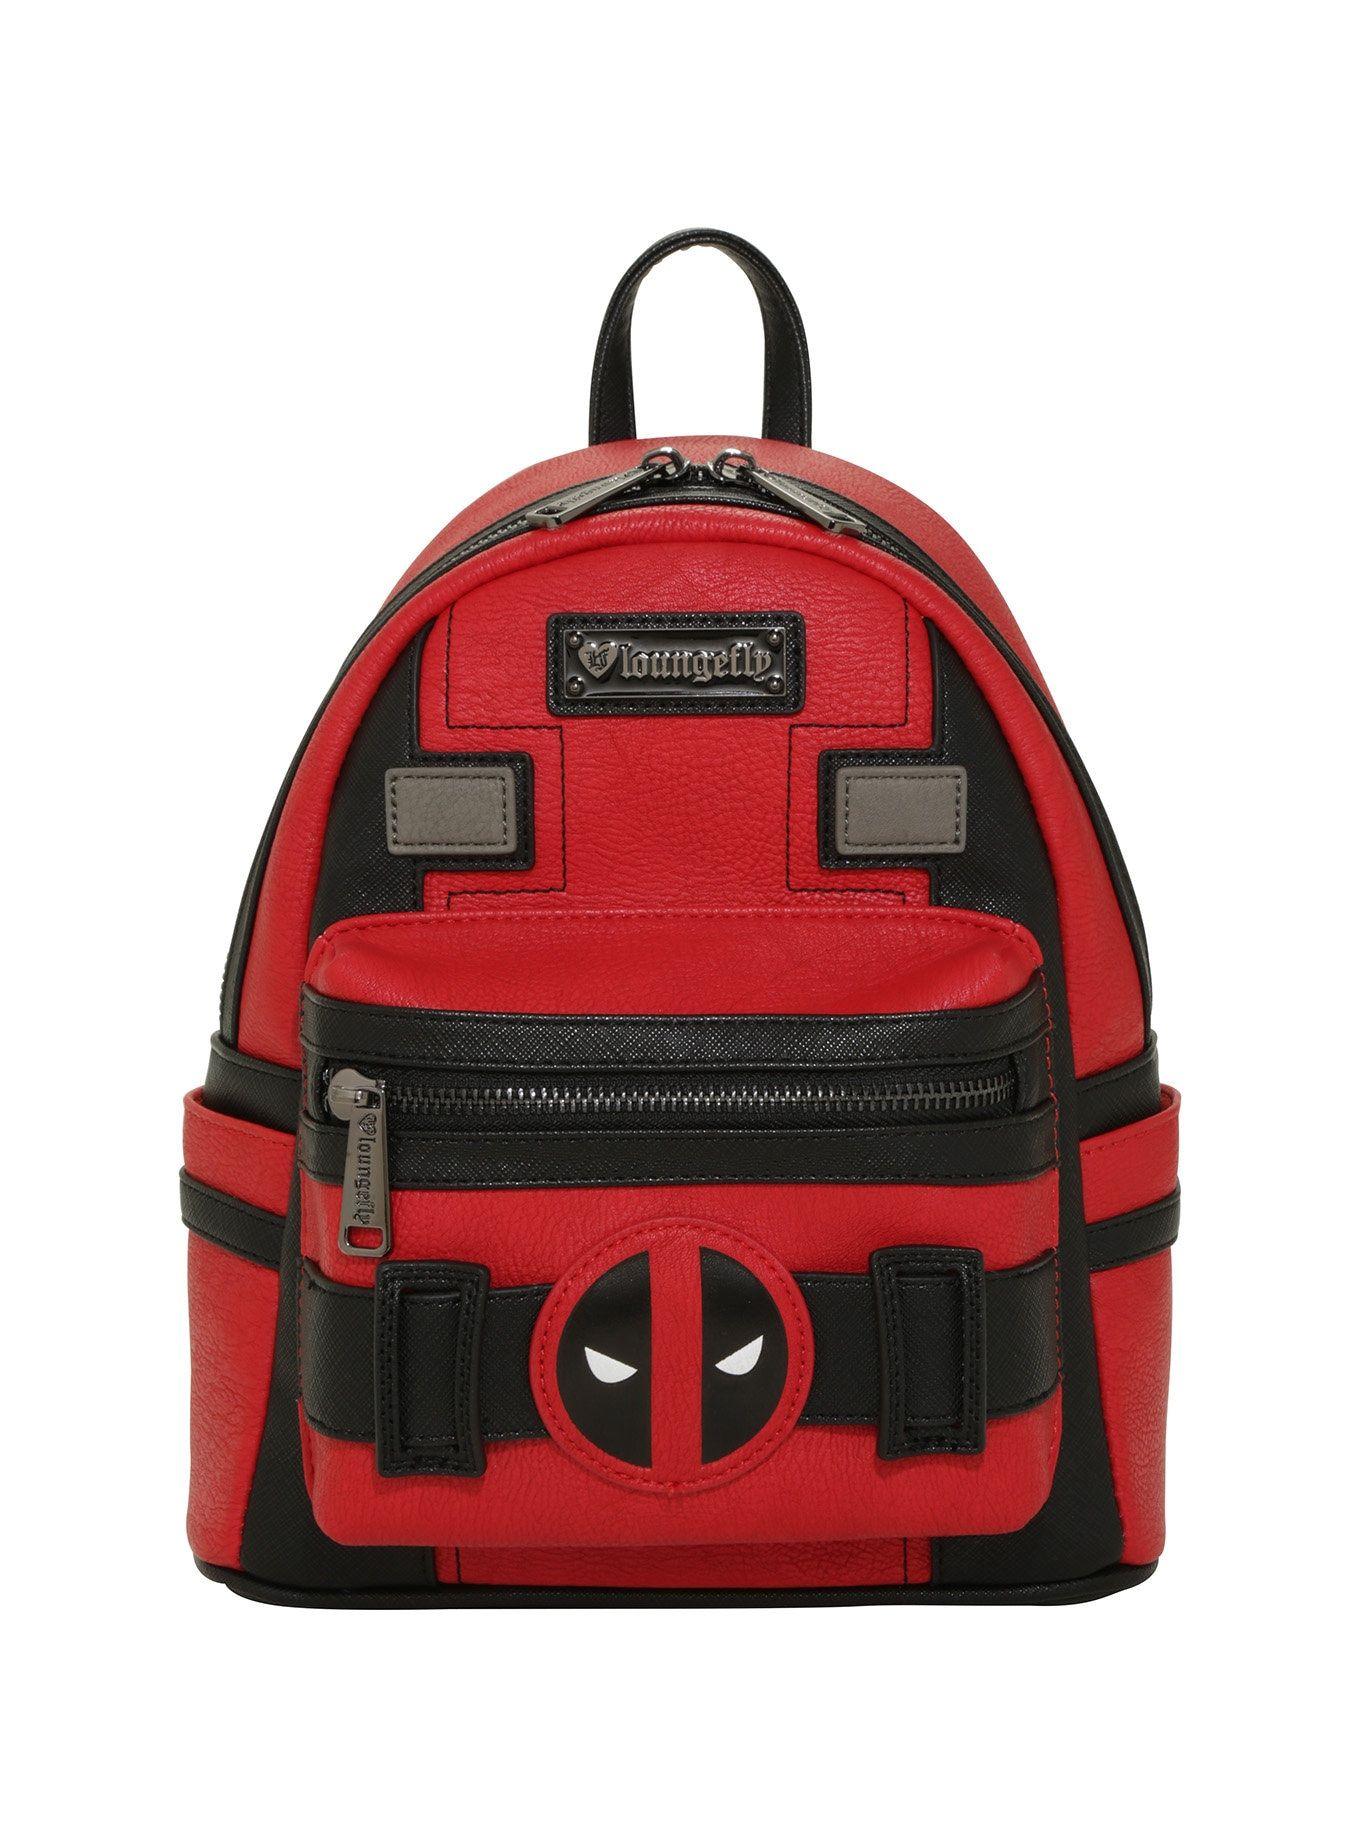 7ebcbf15c00 Loungefly Marvel Deadpool Suit Mini Backpack